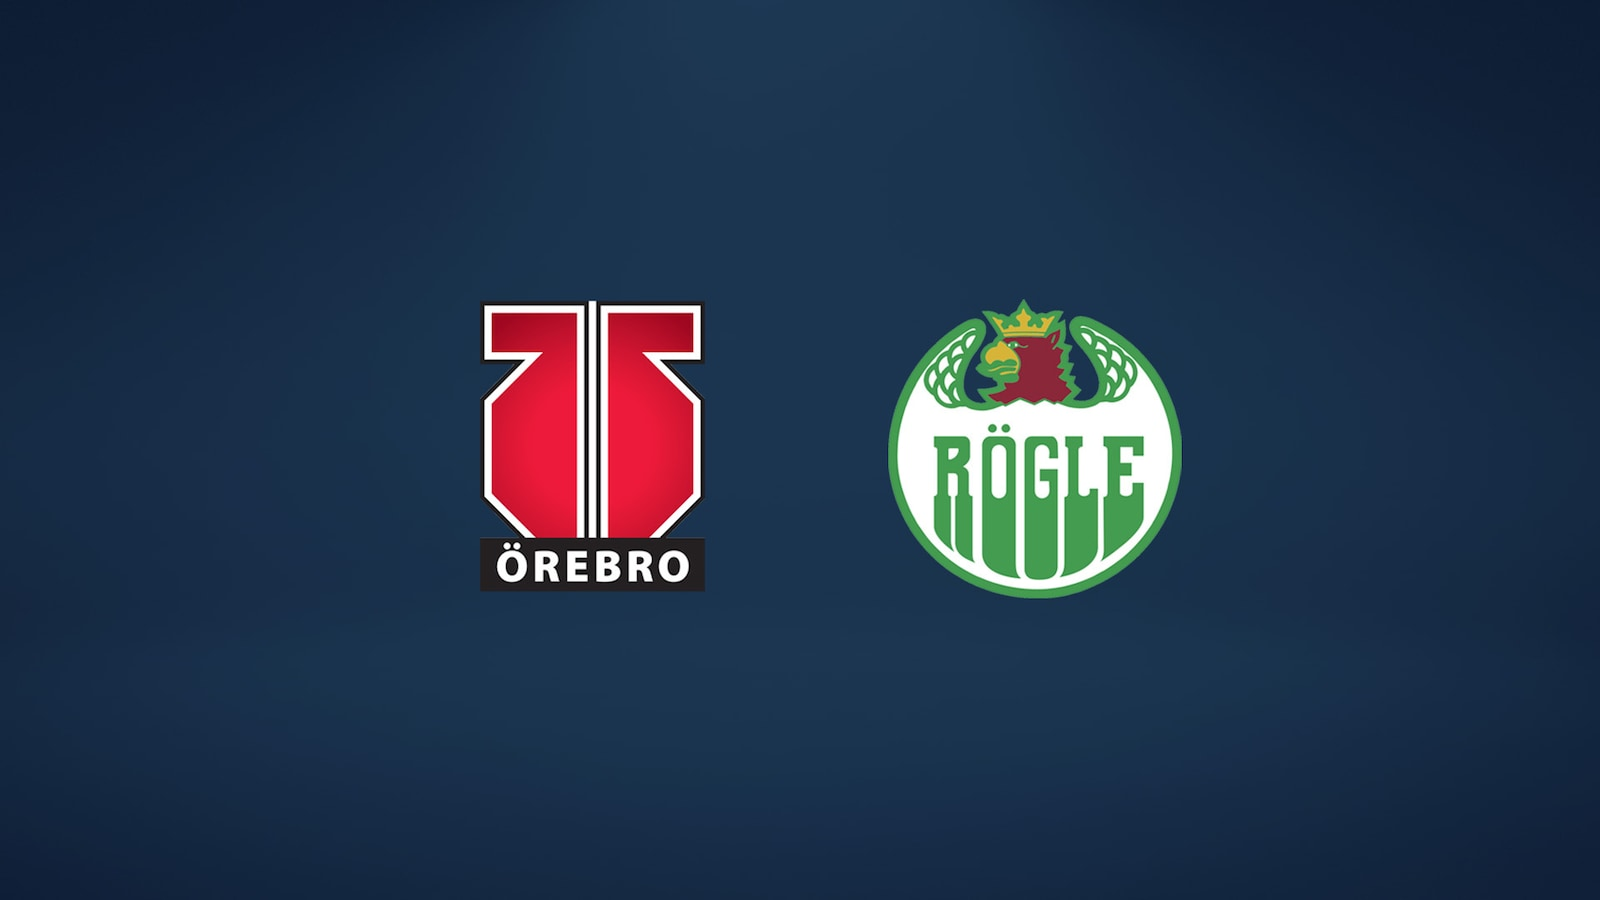 Örebro - Rögle